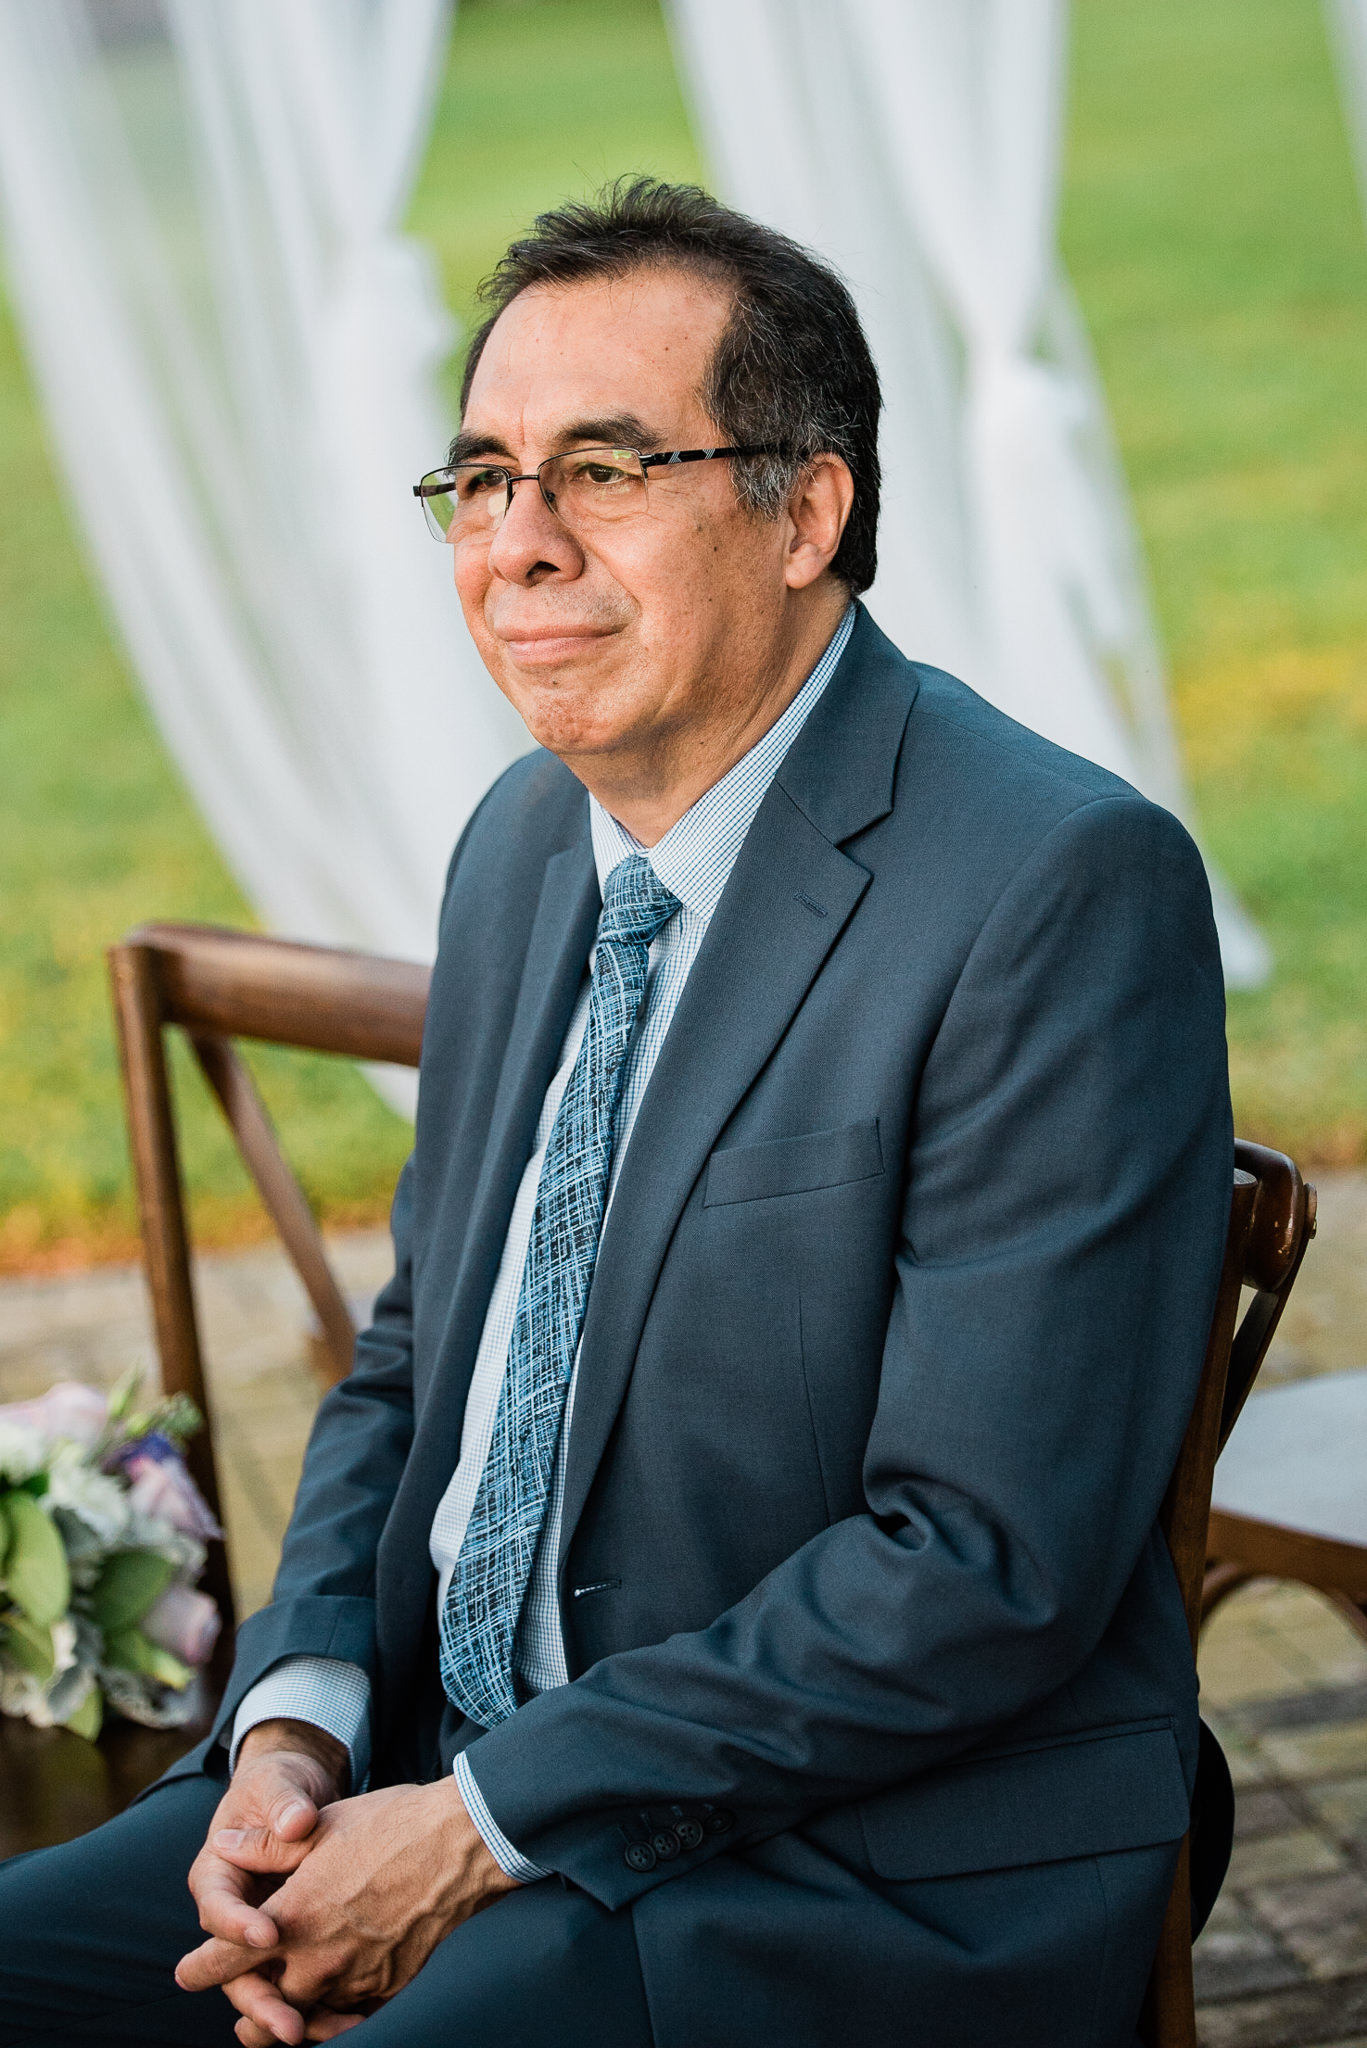 TAMPA_WEDDING_PHOTOGRAPHER_AAMZ_7139.jpg